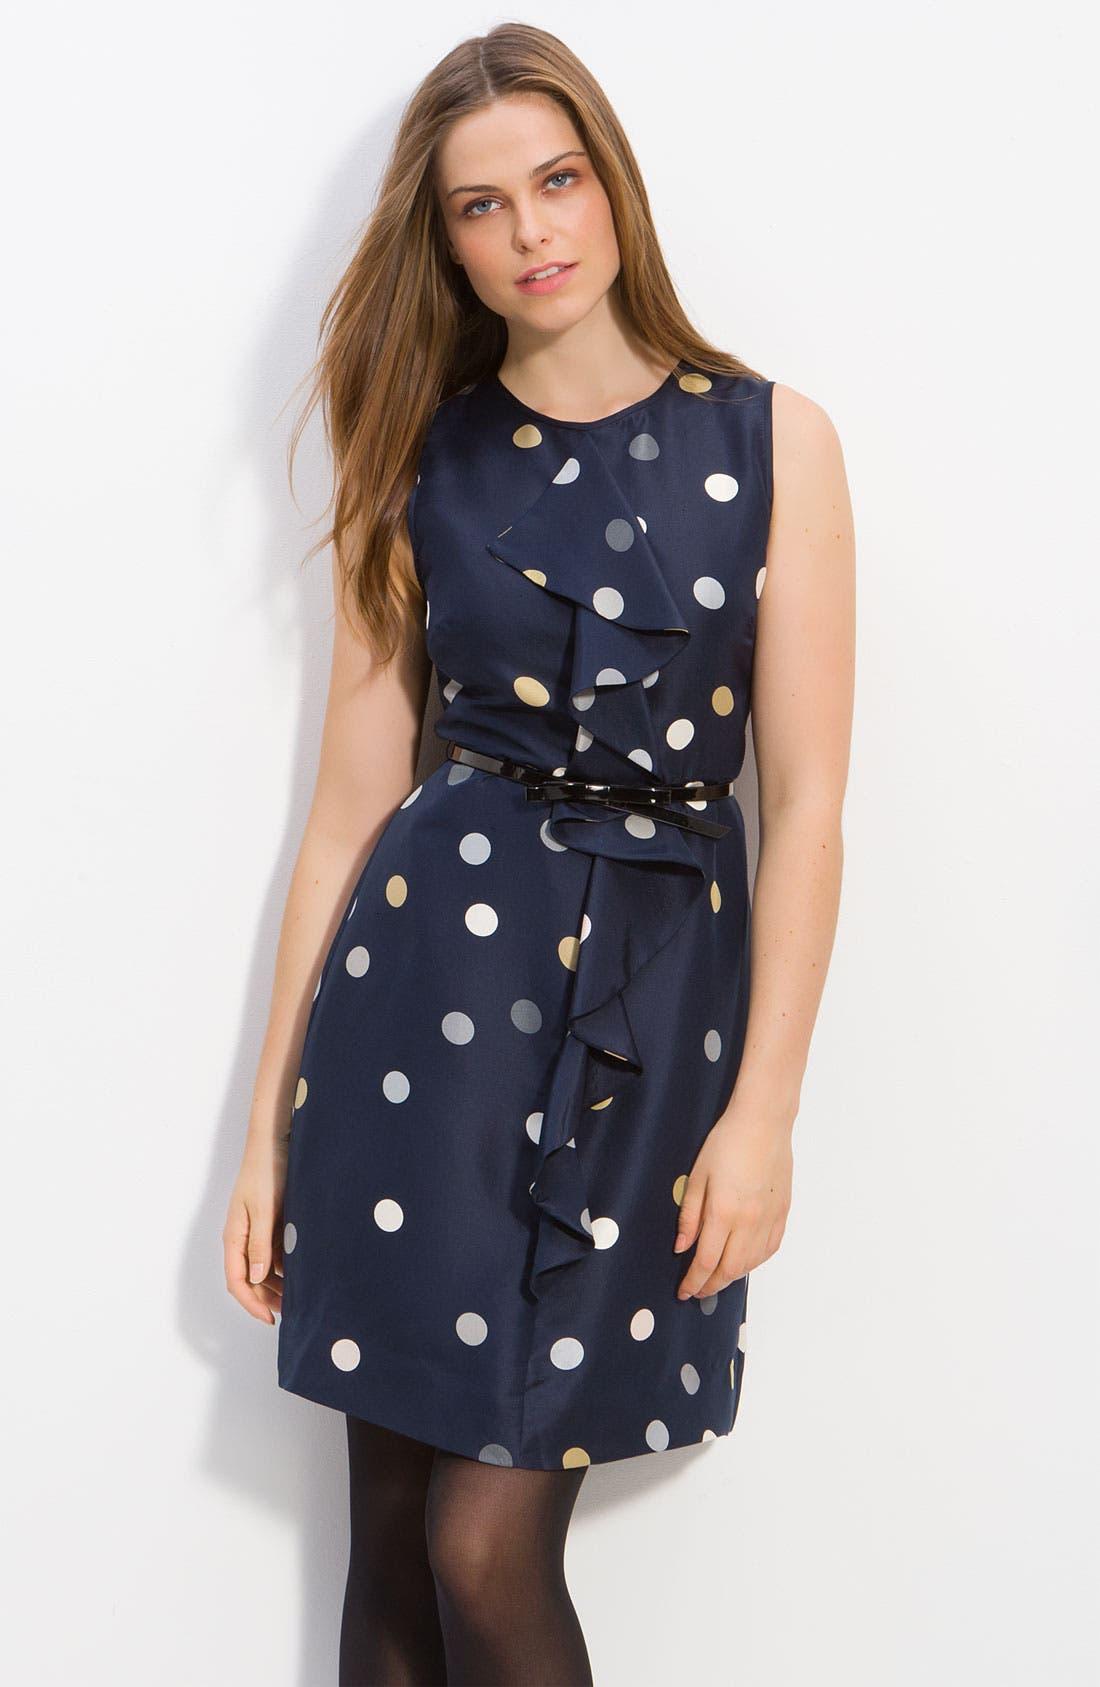 Alternate Image 1 Selected - kate spade new york 'bailey' polka dot ruffle dress